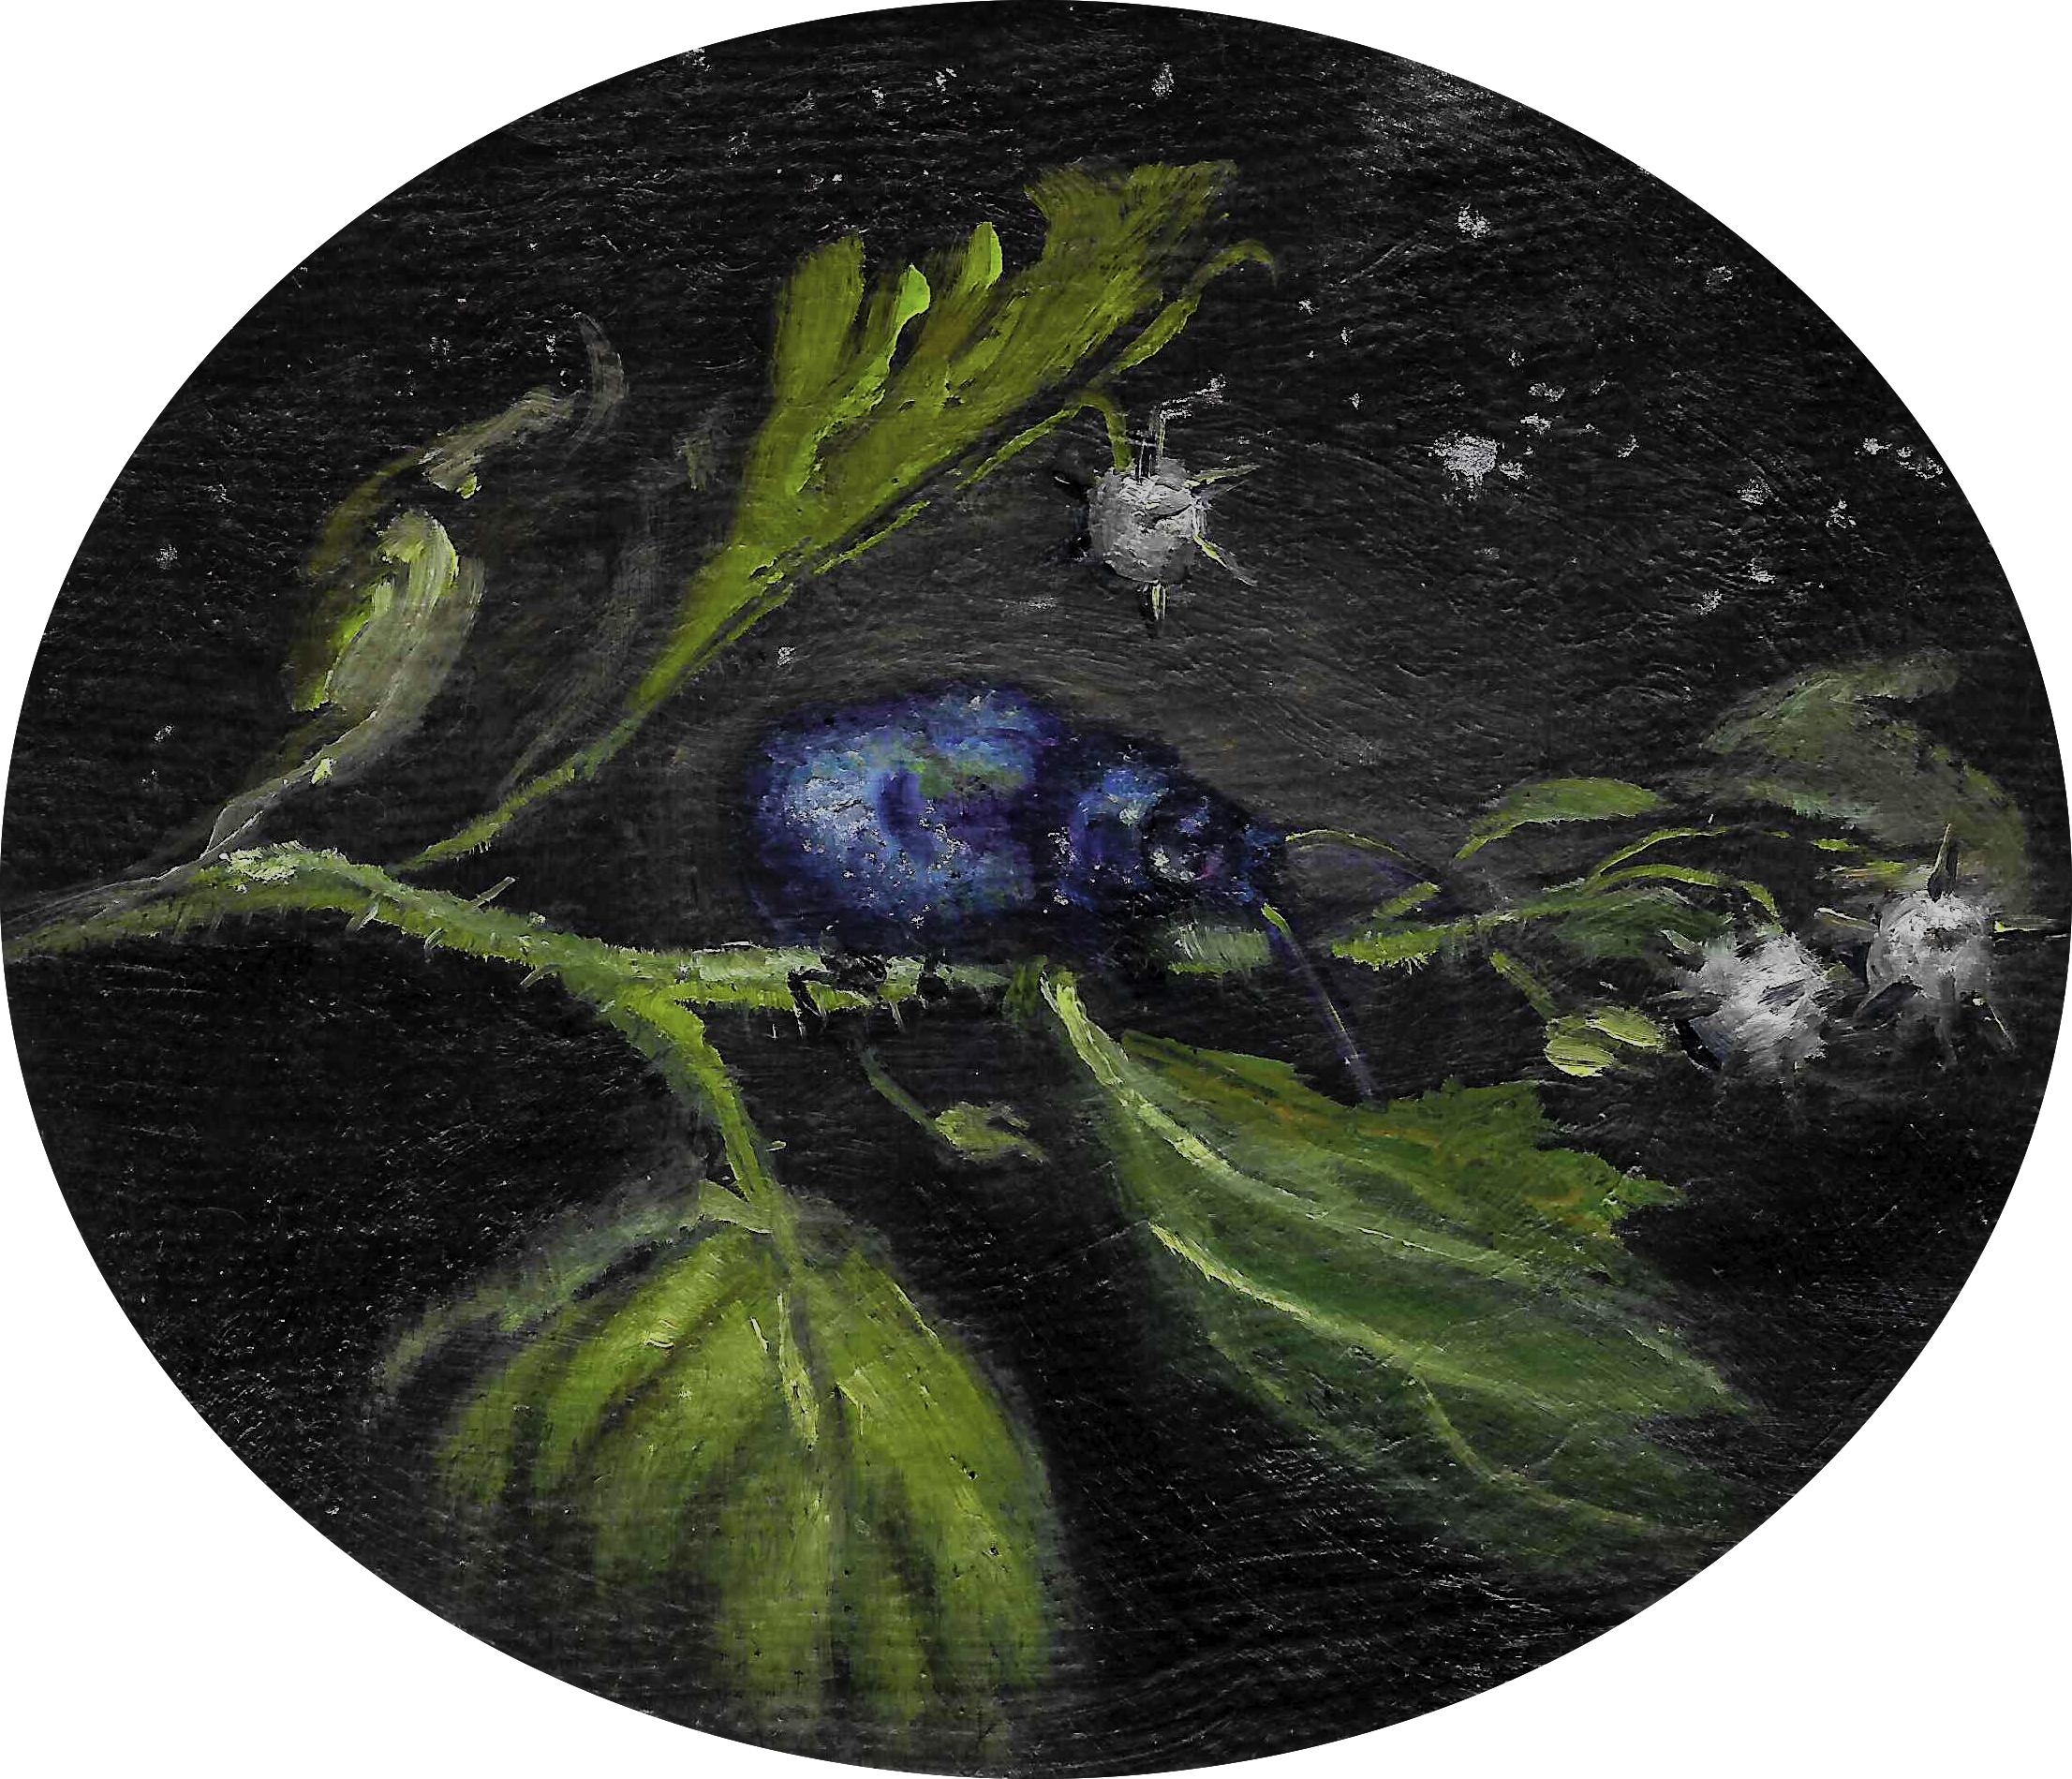 2017 - 'Mint Leaf Beetle by Moonlight'